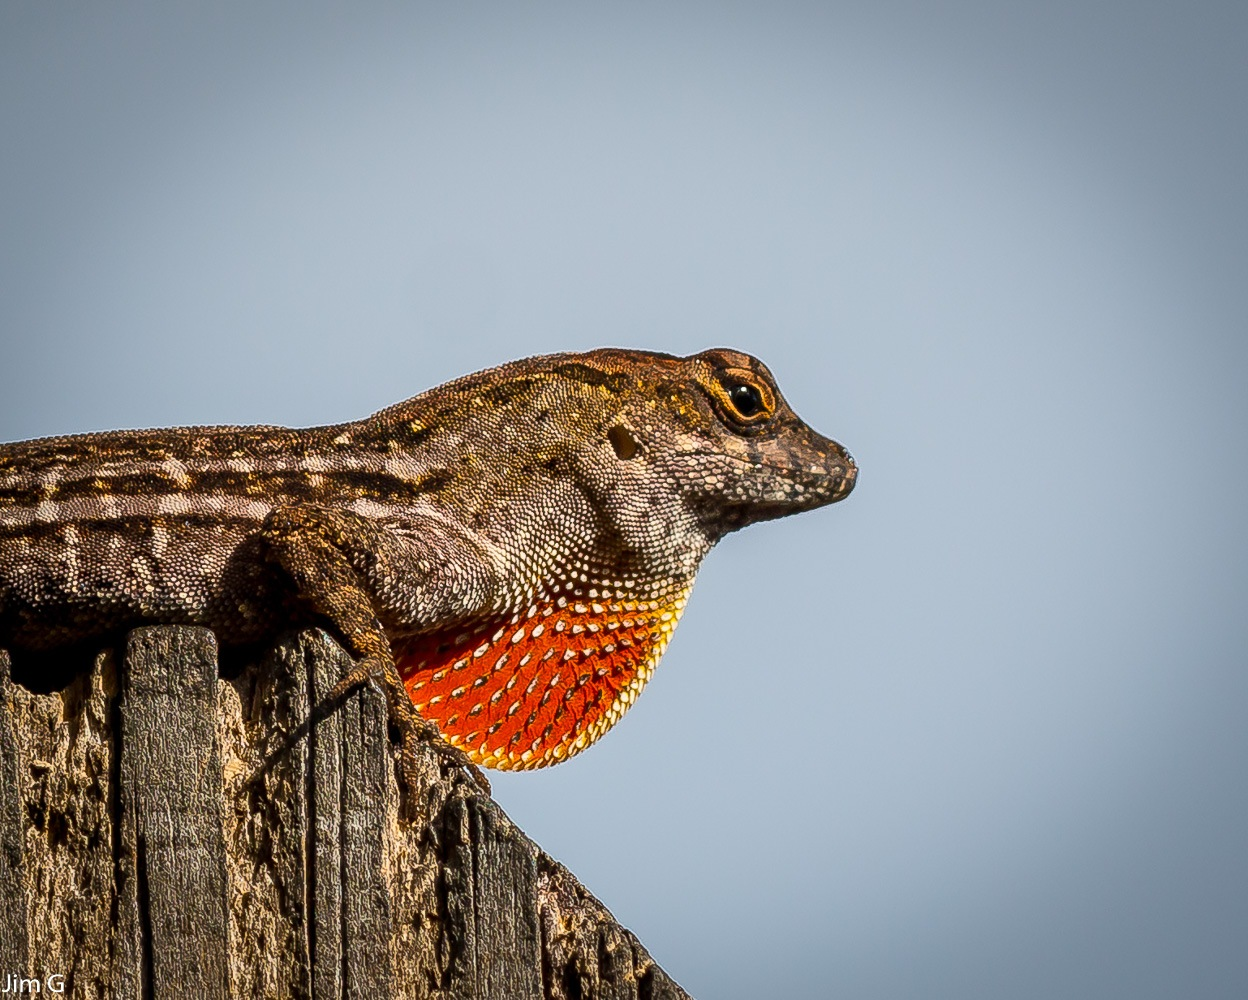 Lizard Macro by Jim Graham